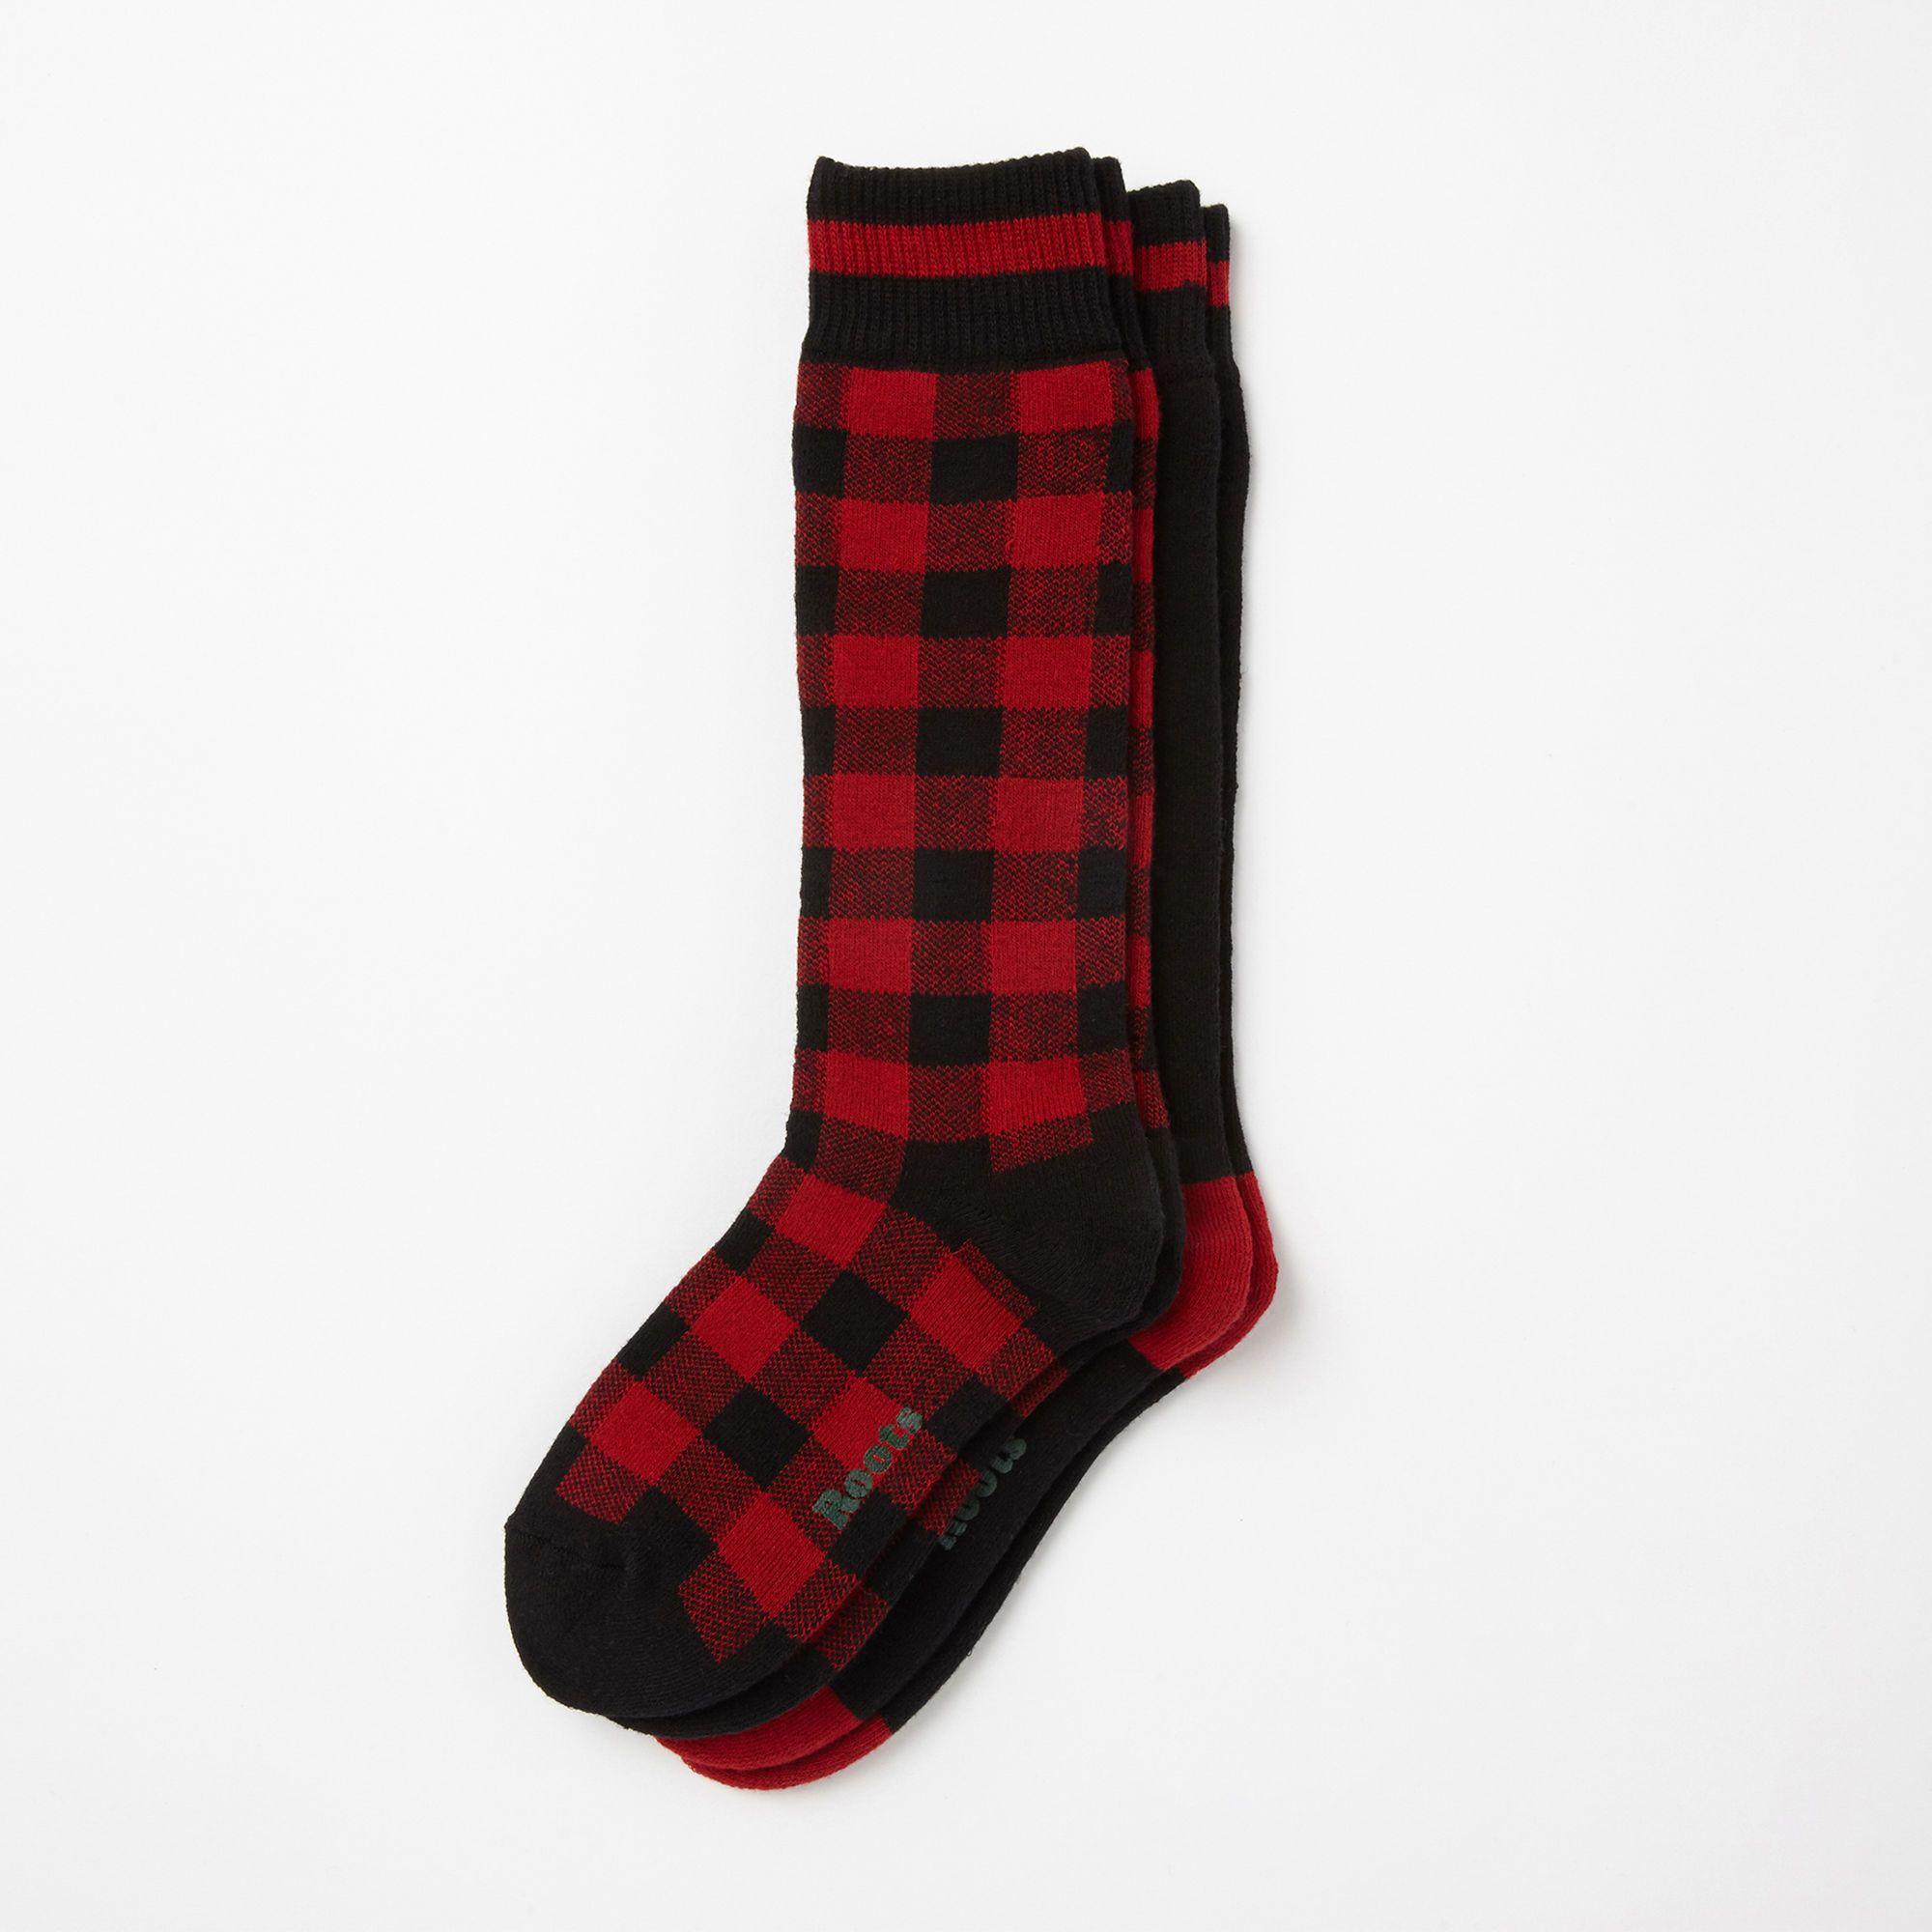 Womens Buffalo Check Socks 2 P Roots Canada Clothes Camping Outfits Buffalo Plaid